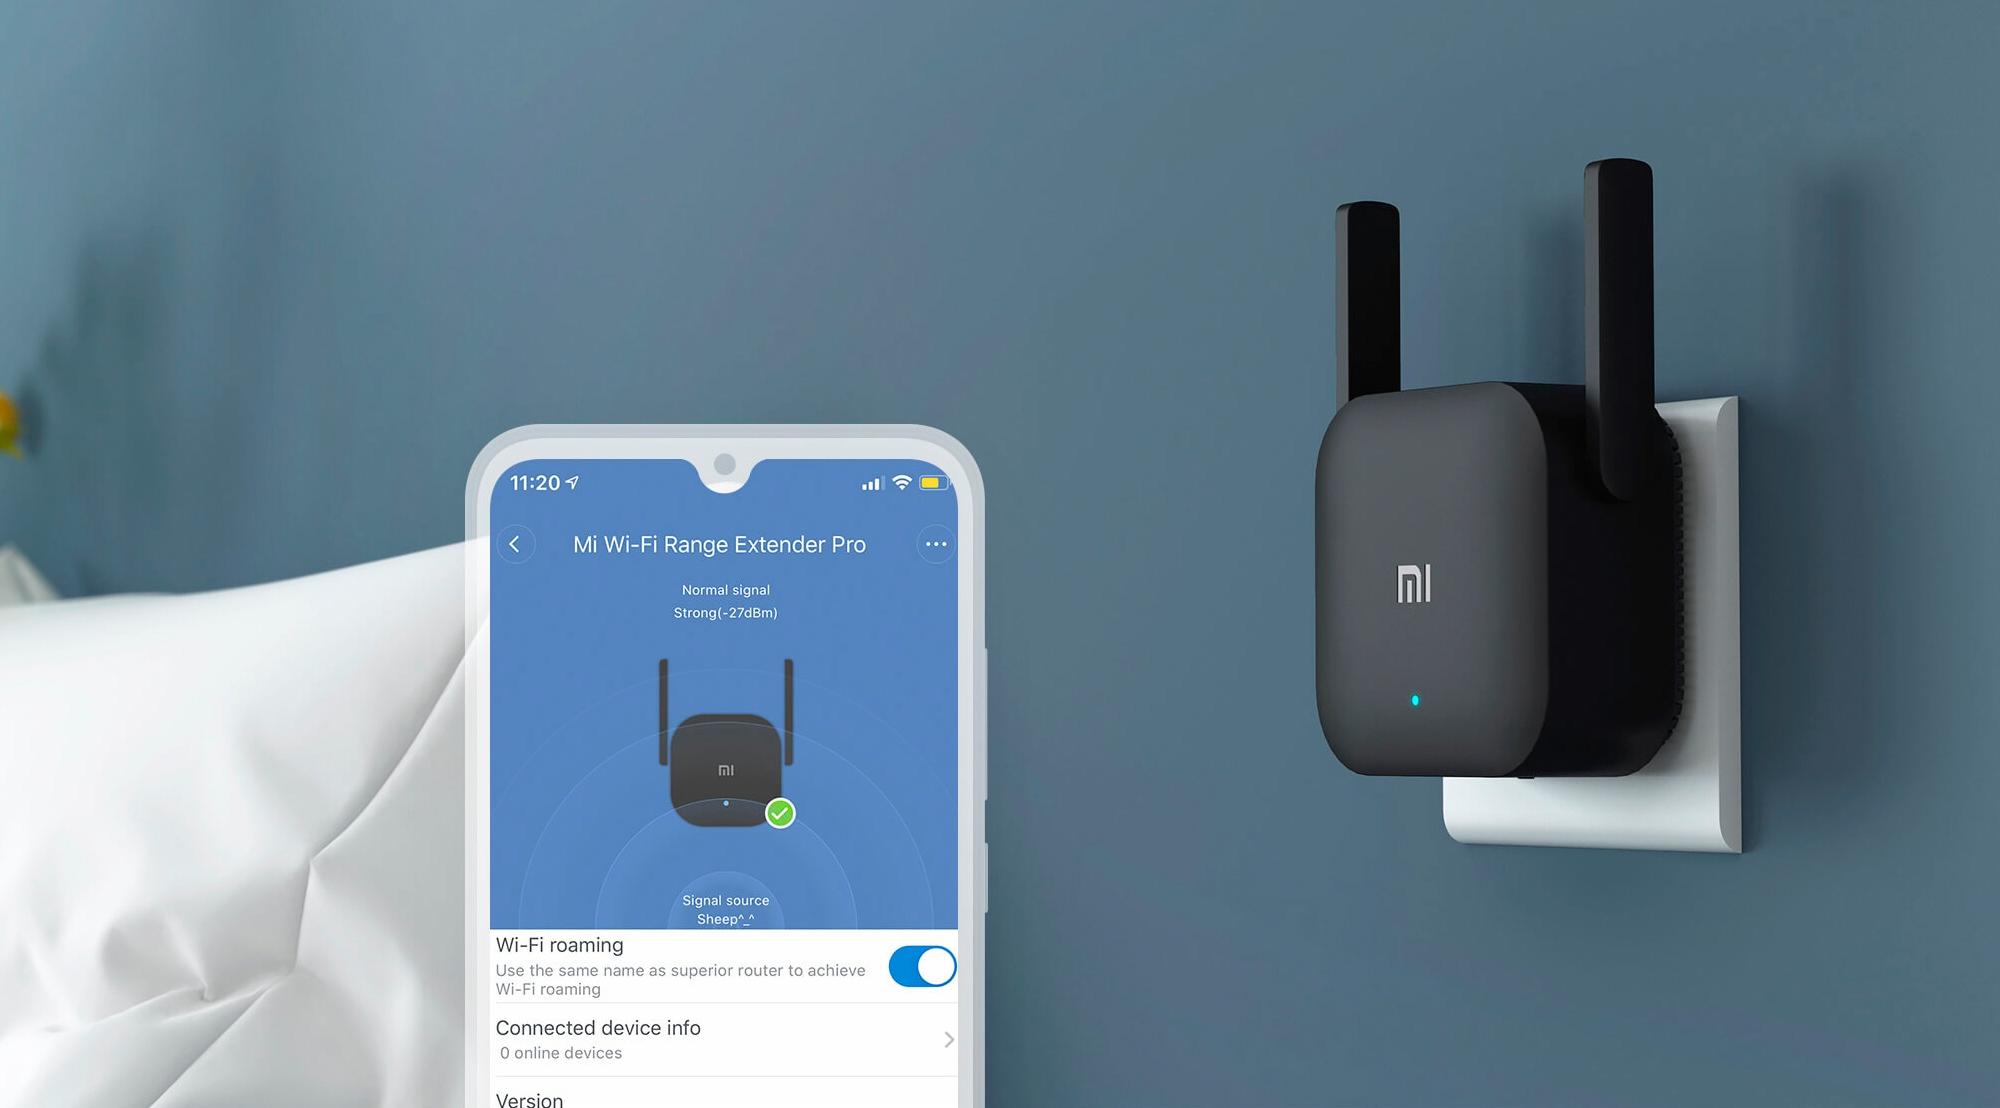 Extensor Xiaomi Mi Wi-Fi Range Extender Pro 5